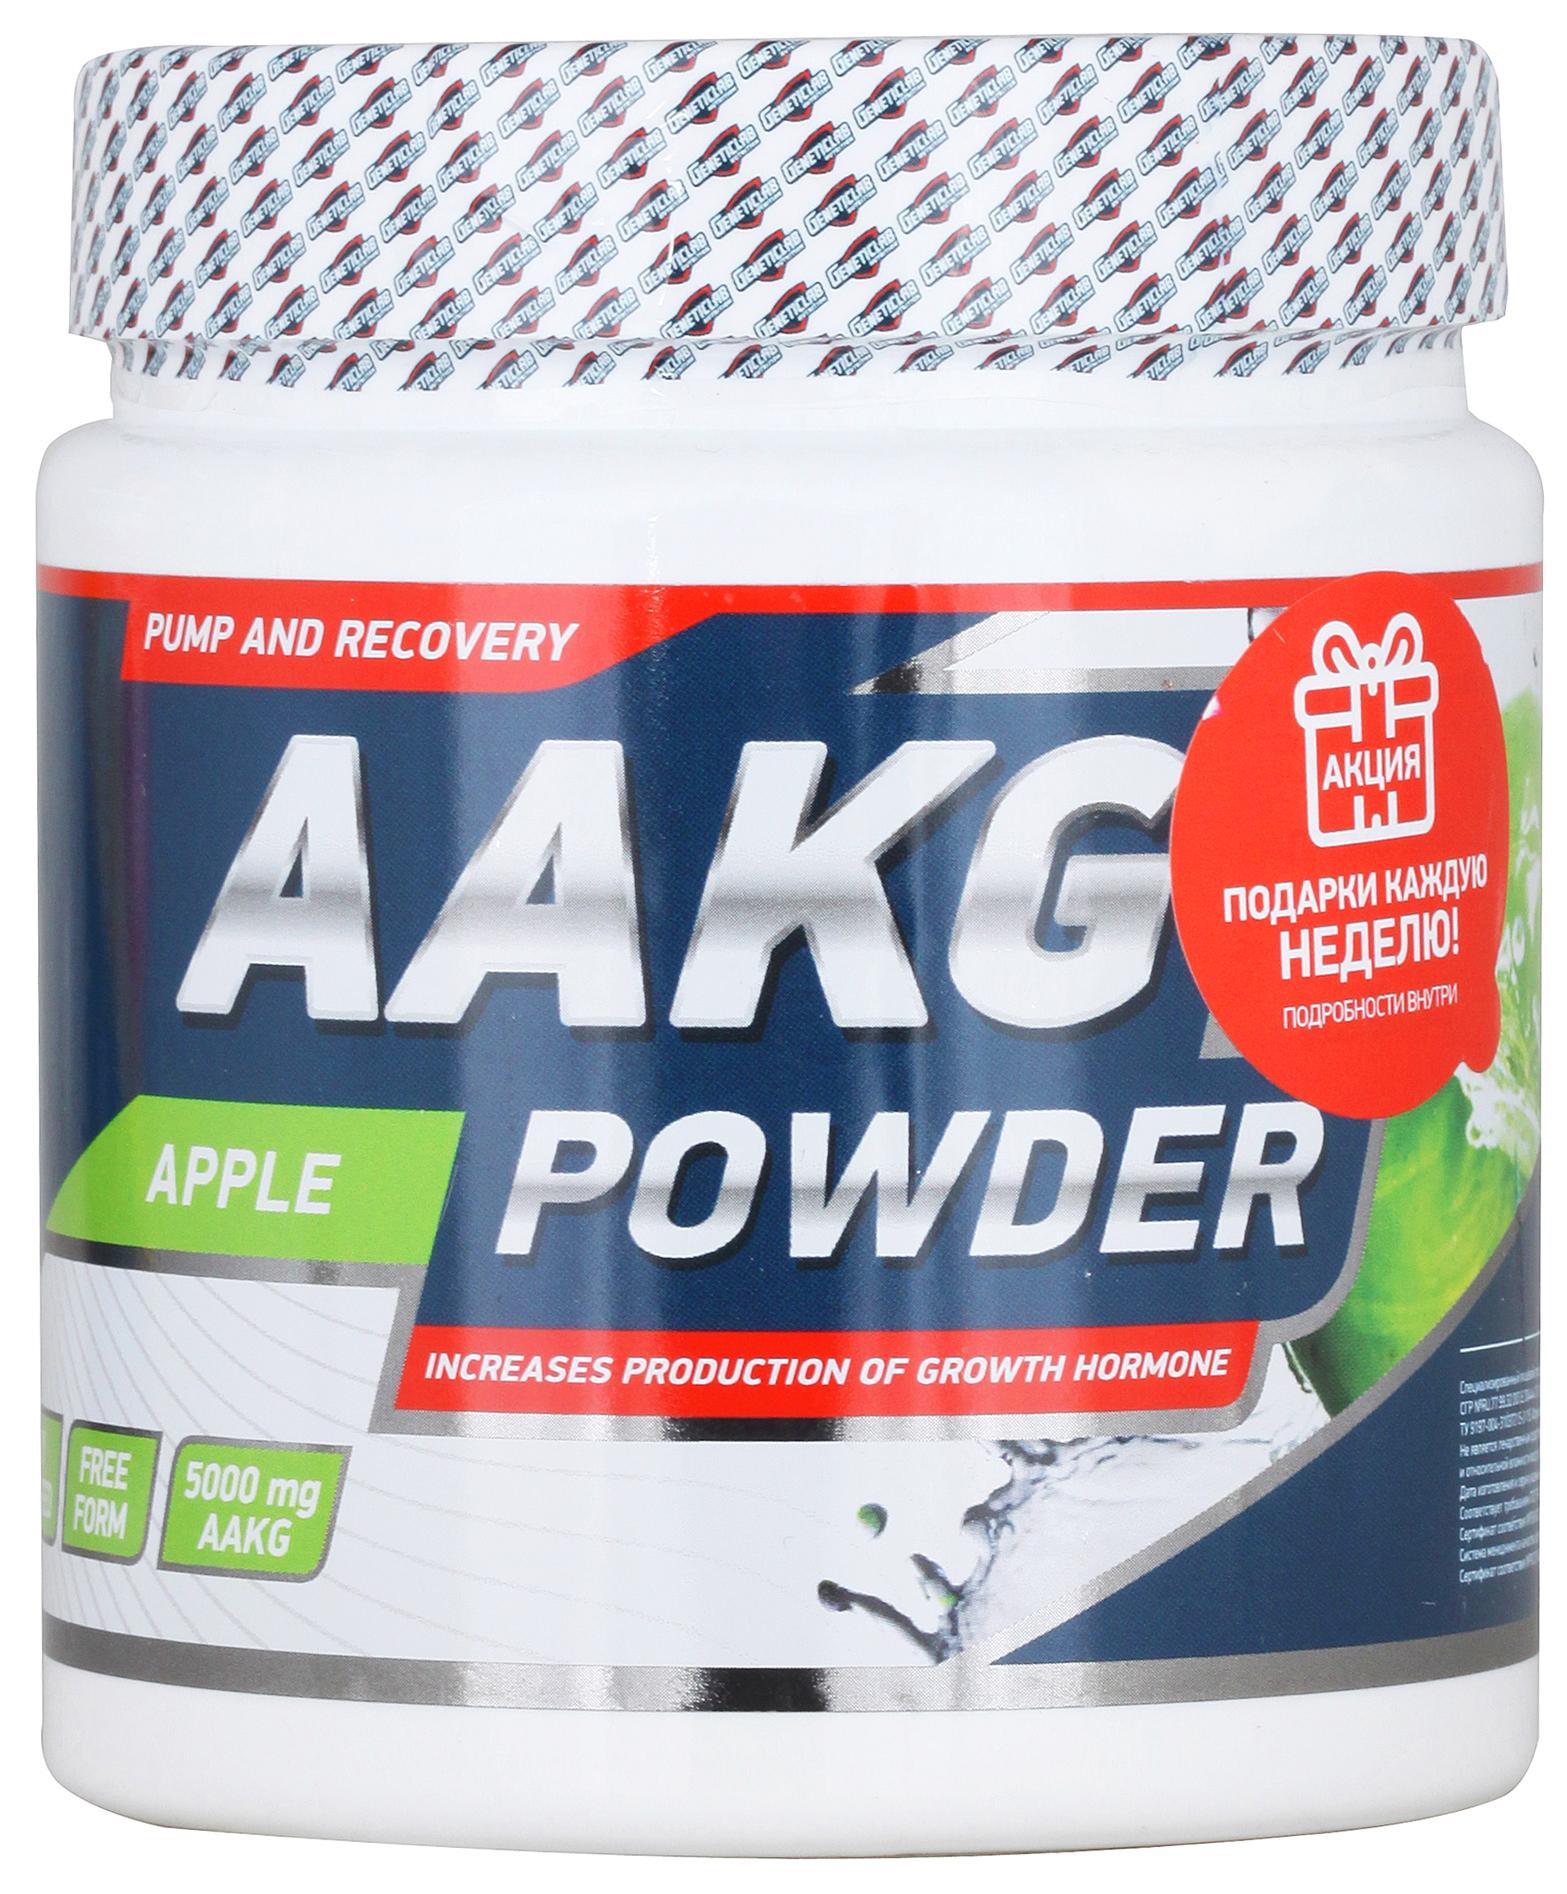 AAKG powder, вкус яблоко, 150 гр, Geneticlab